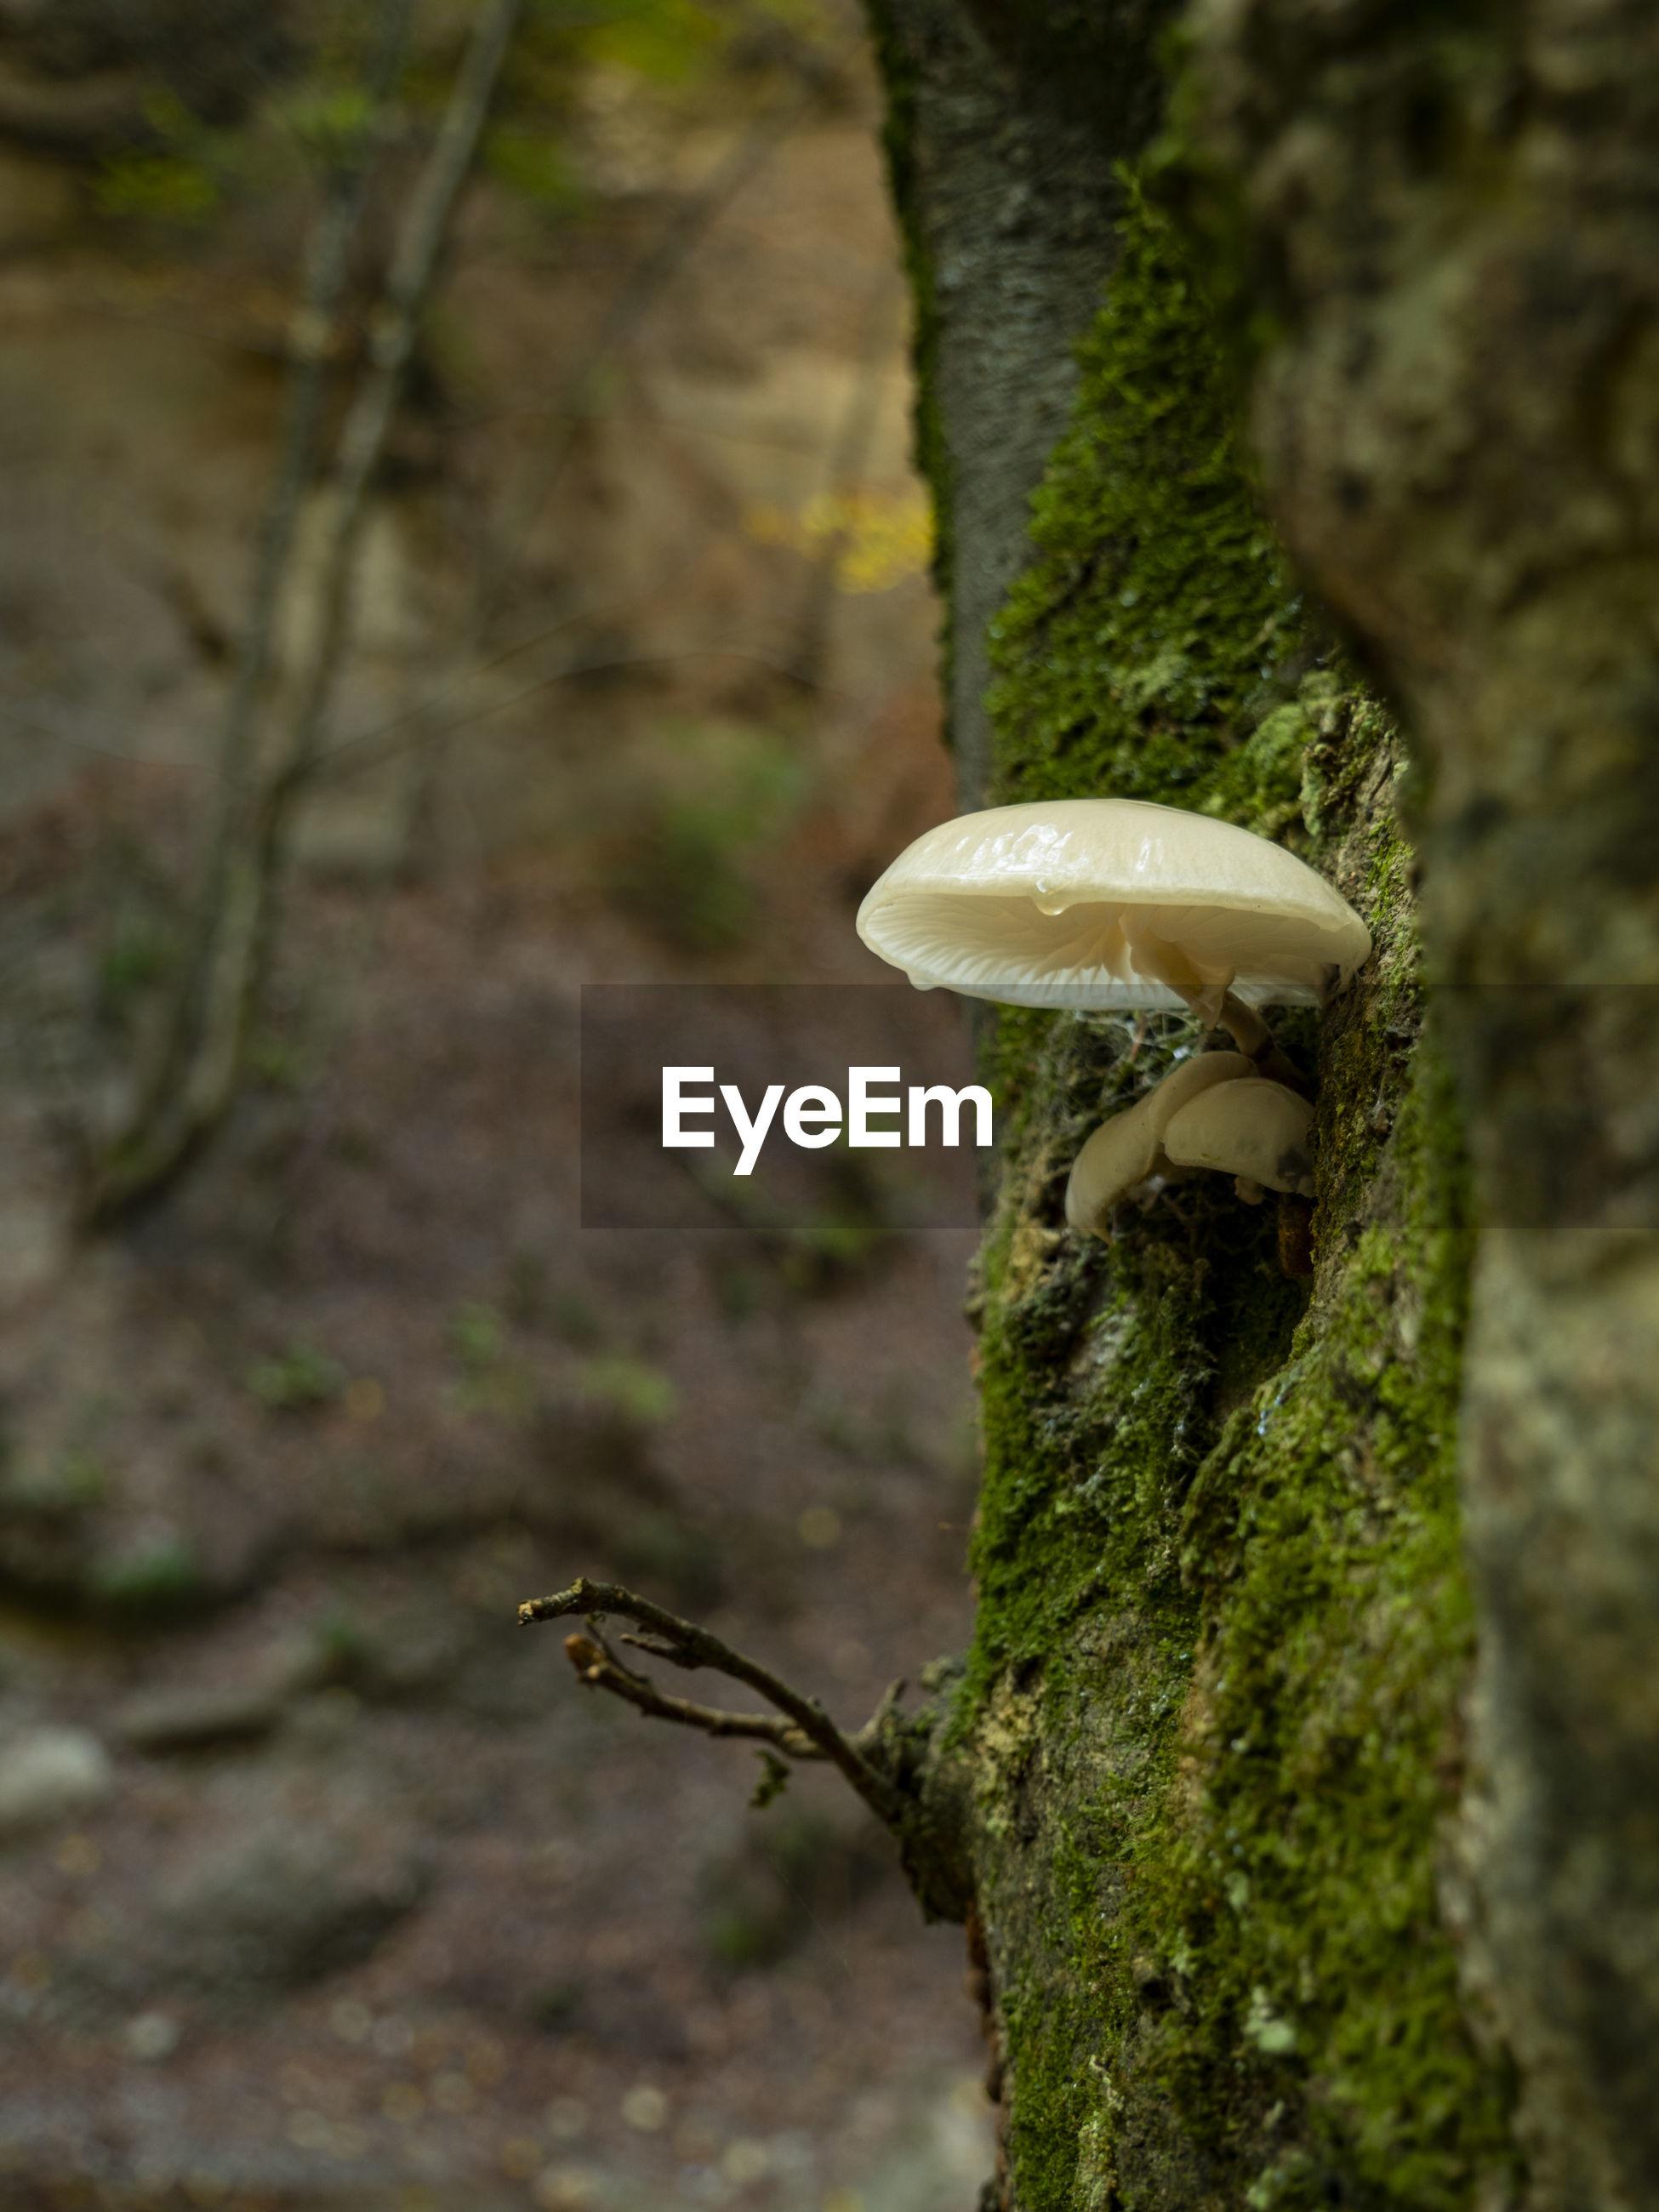 CLOSE-UP OF MUSHROOMS GROWING ON TREE